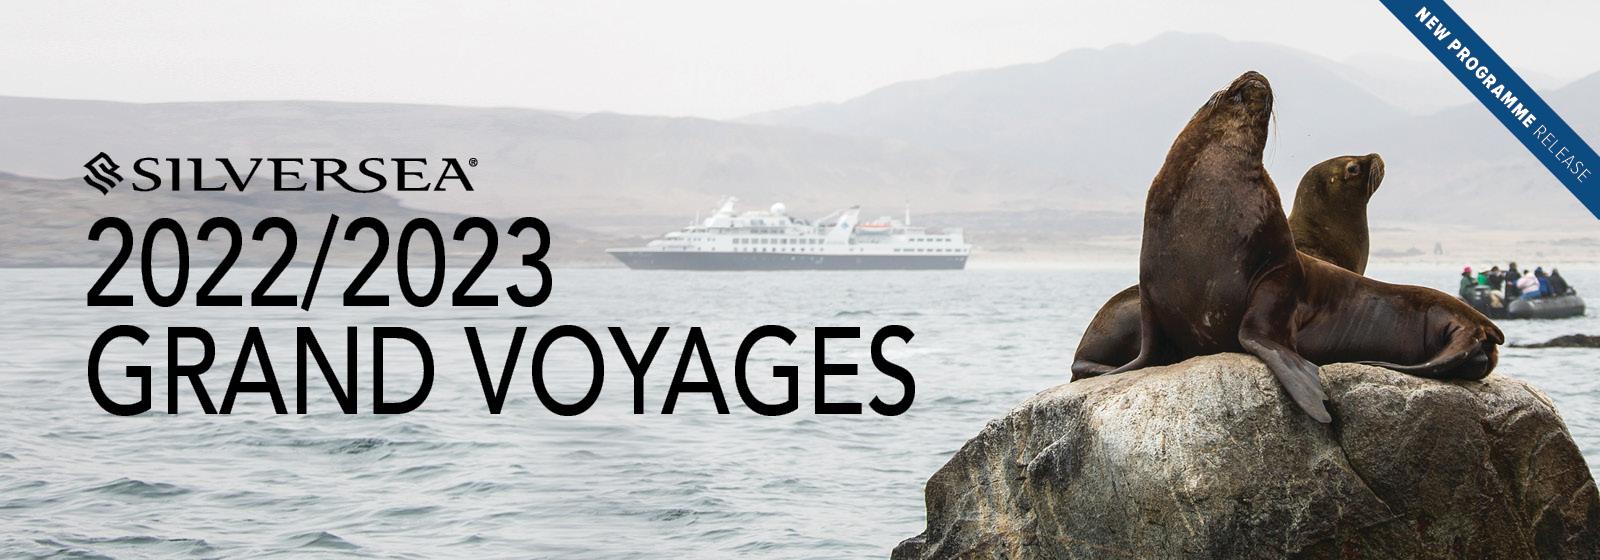 silversea-grand-voyages